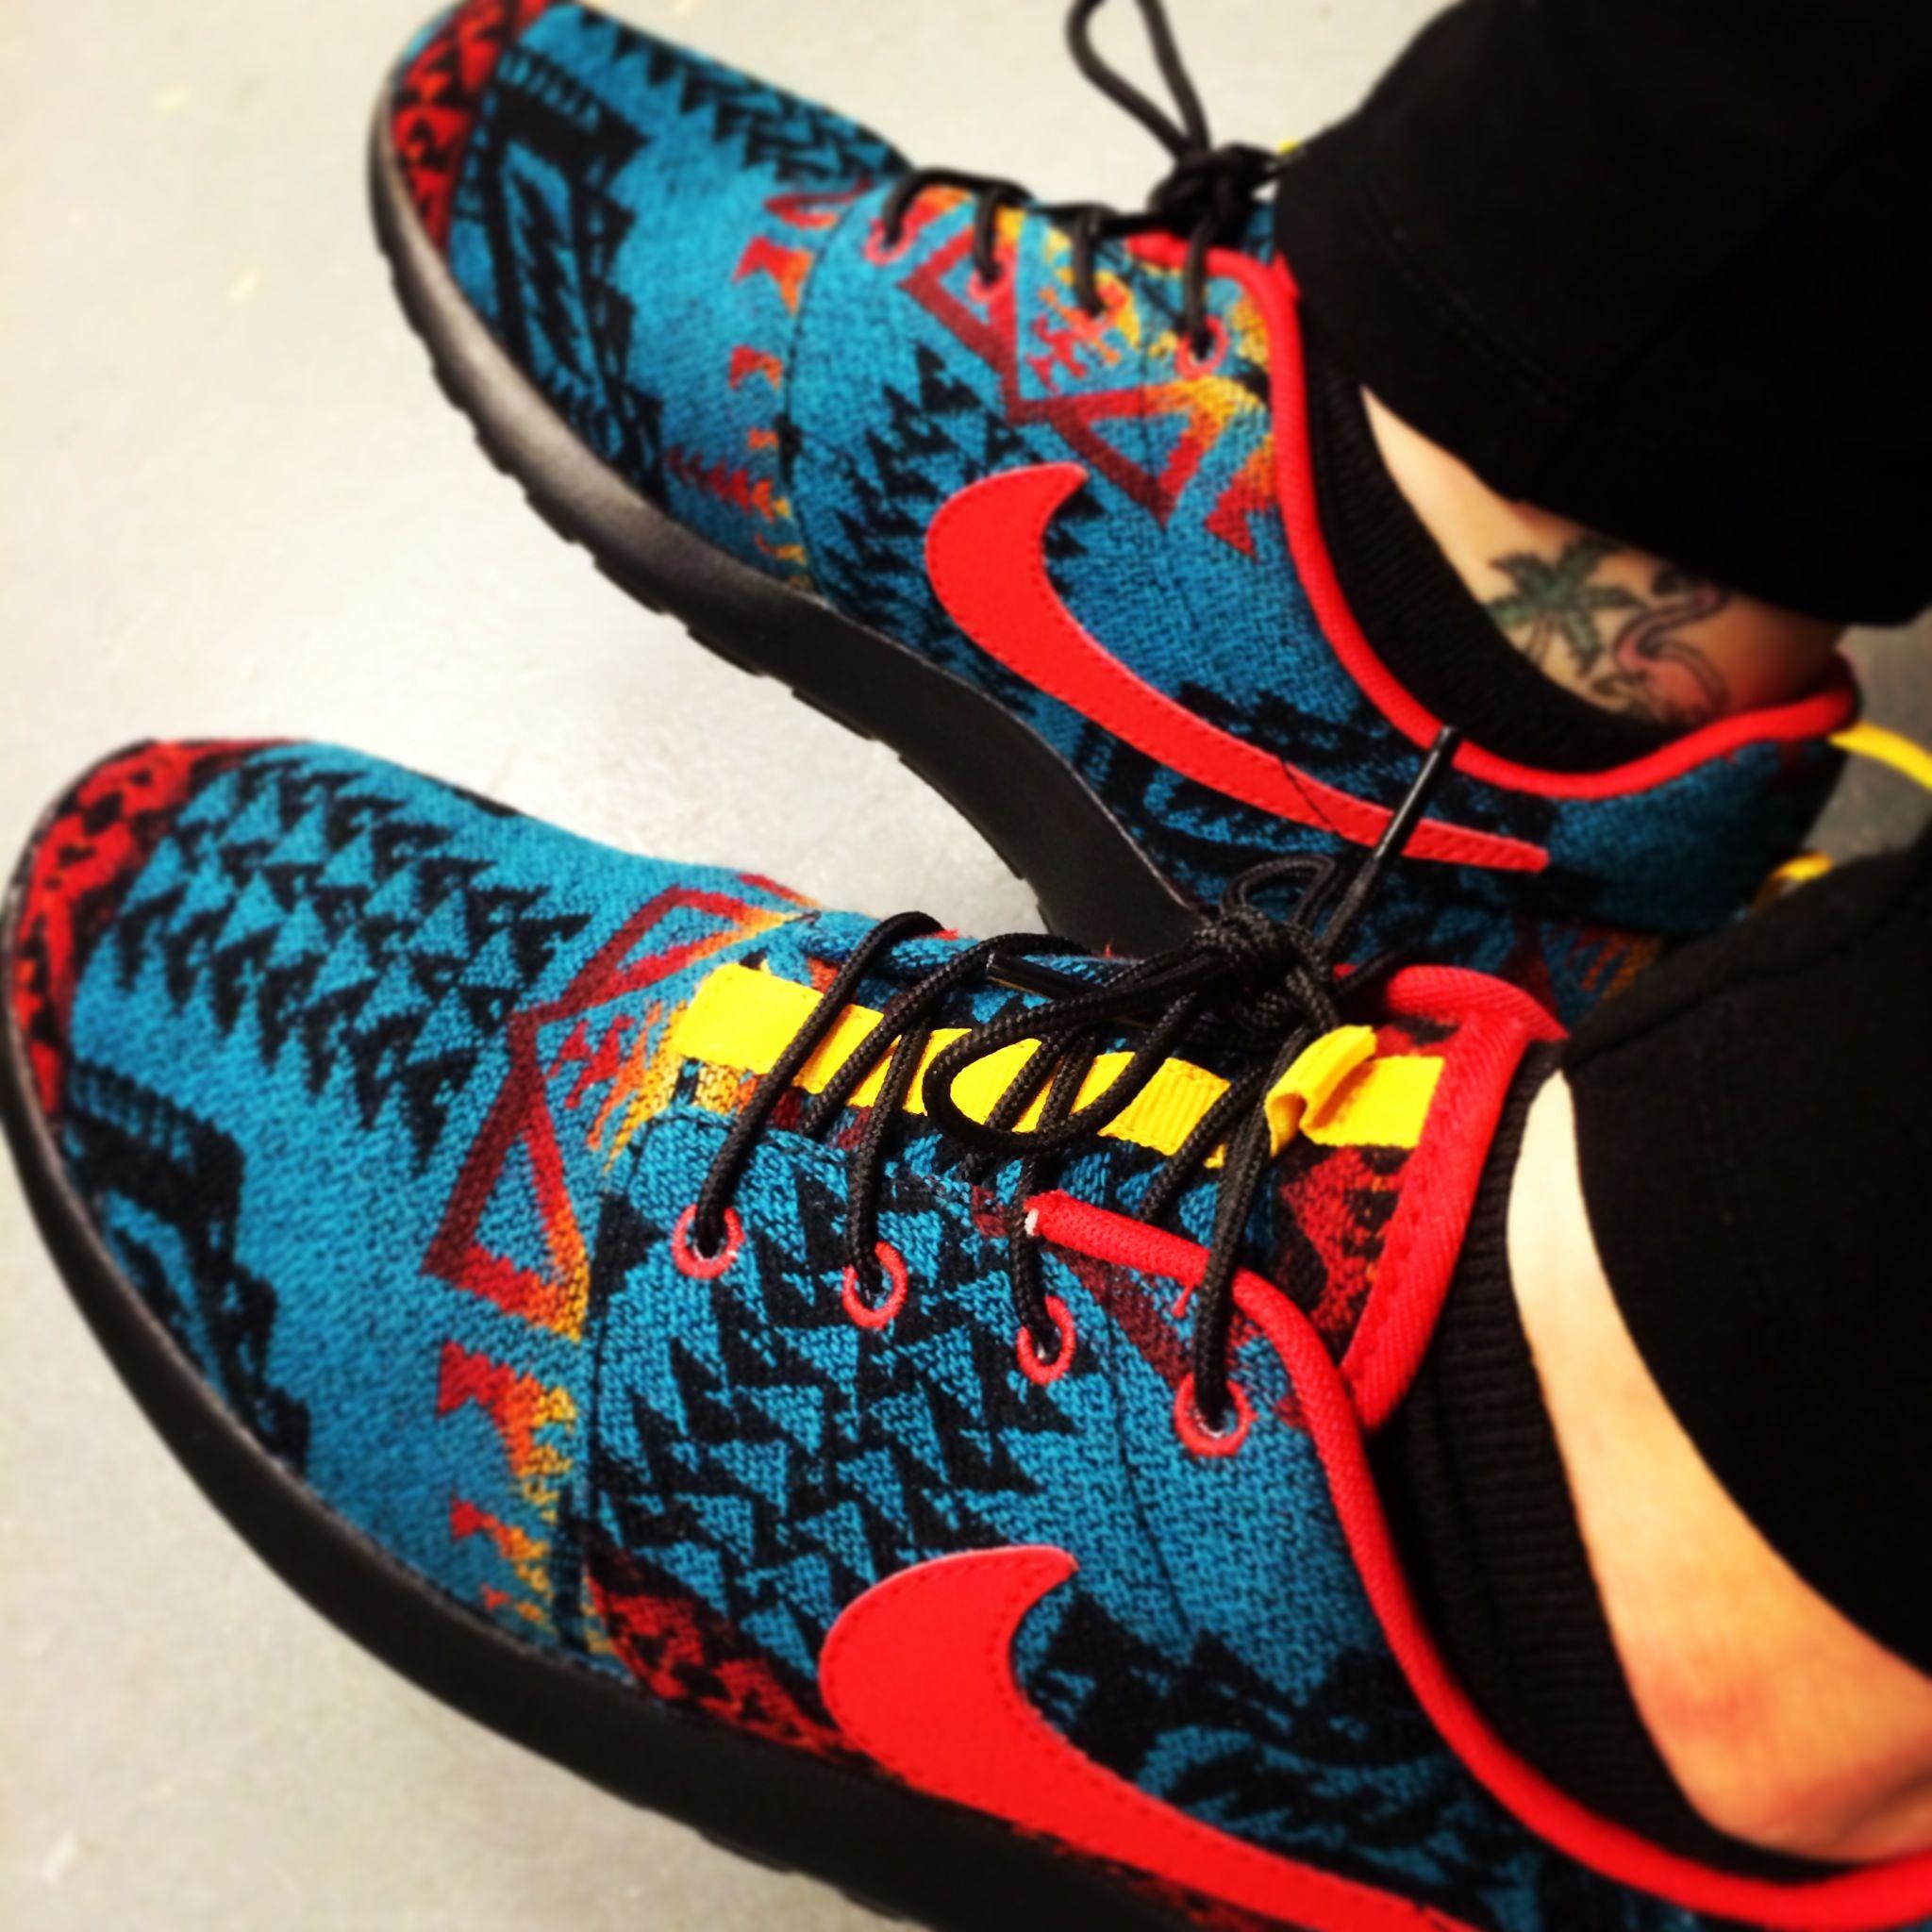 separation shoes 8dc5f 390bf My Nike Roshe Run Pendleton Custom ID s!